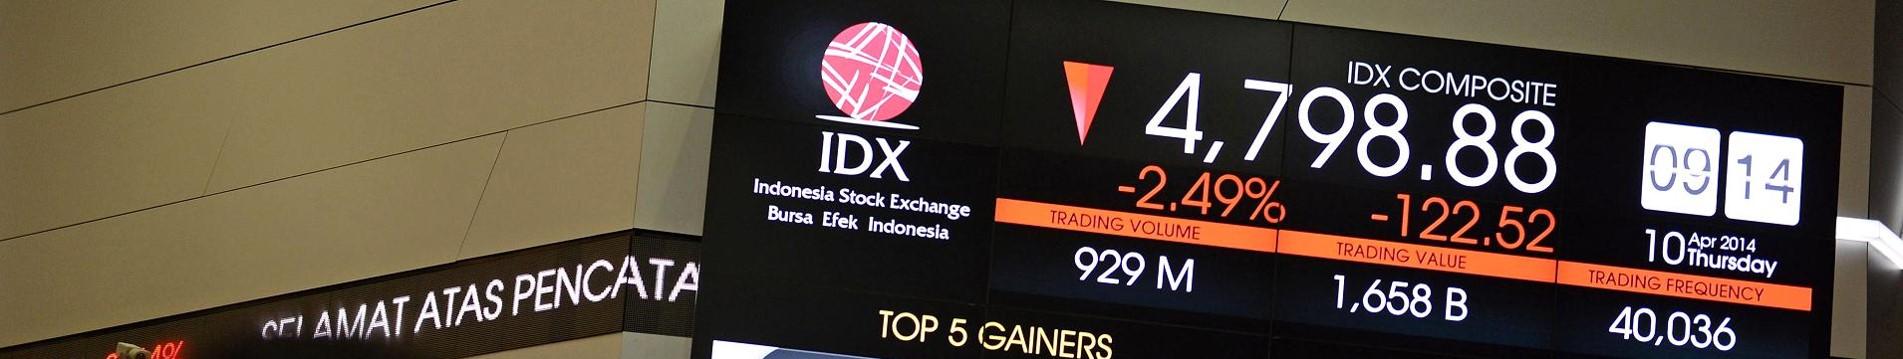 trader dan investor saham idx